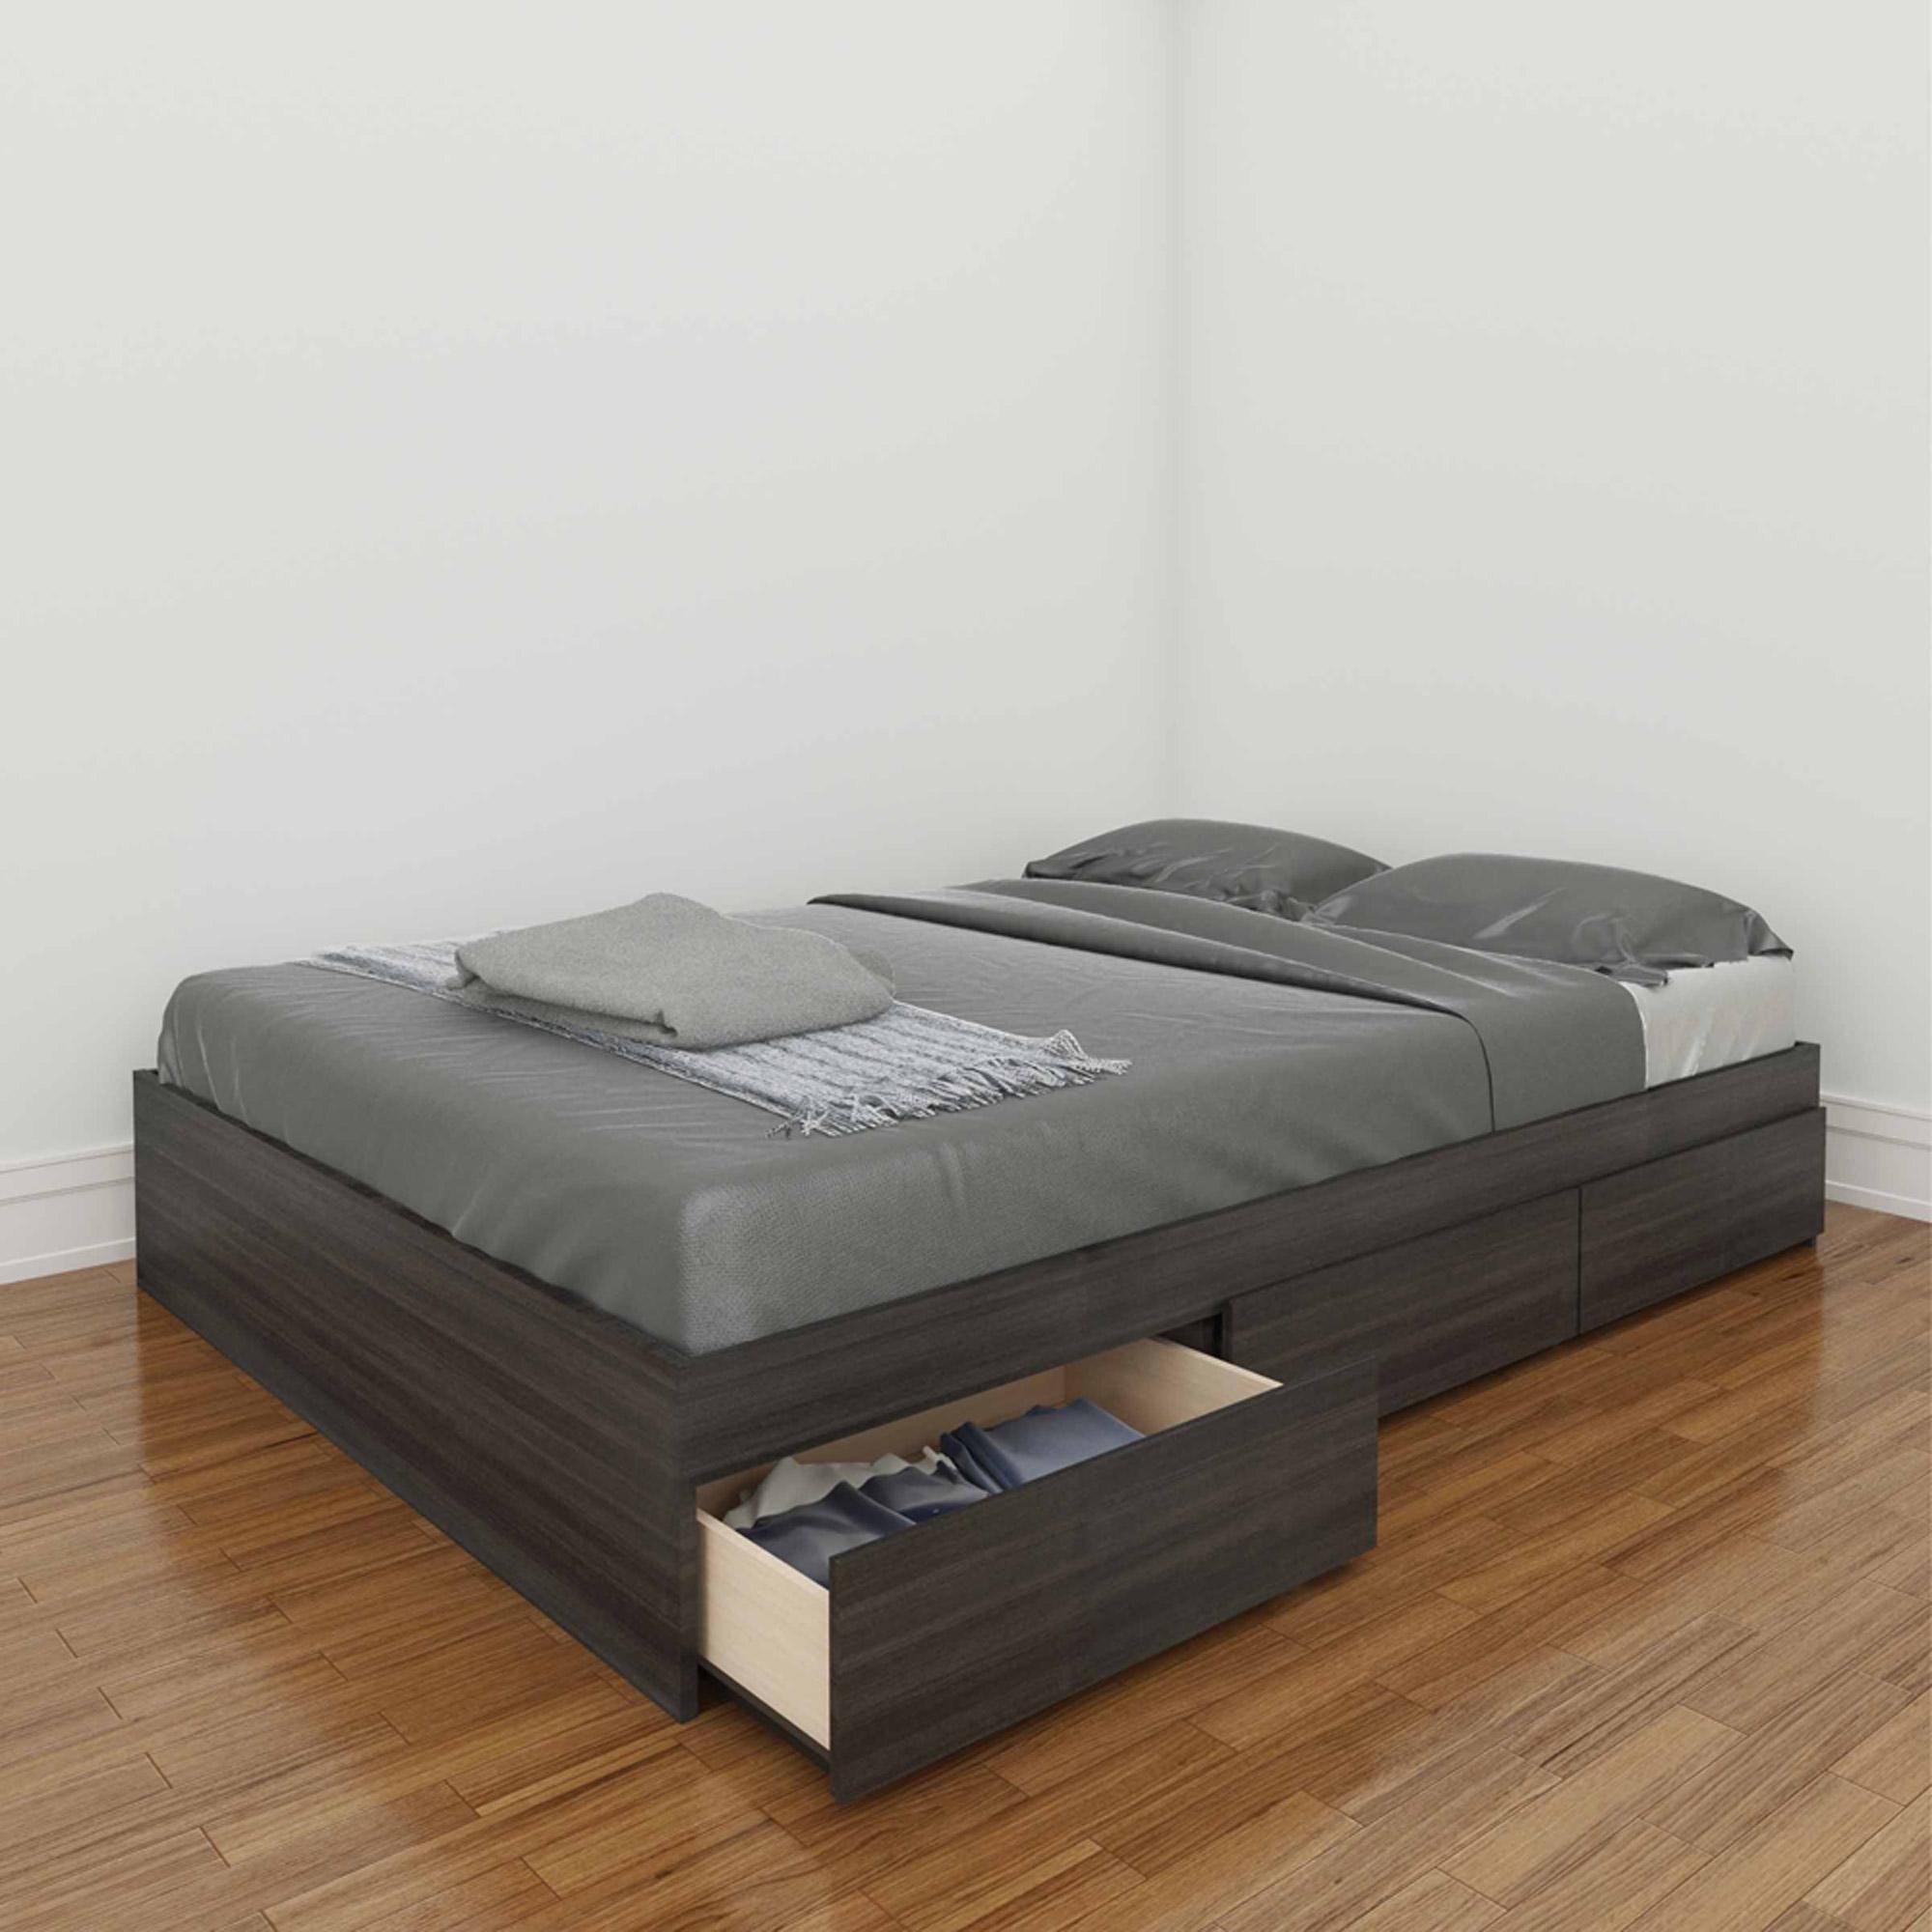 Nexera Atom Full Reversible Storage Bed, White/Ebony